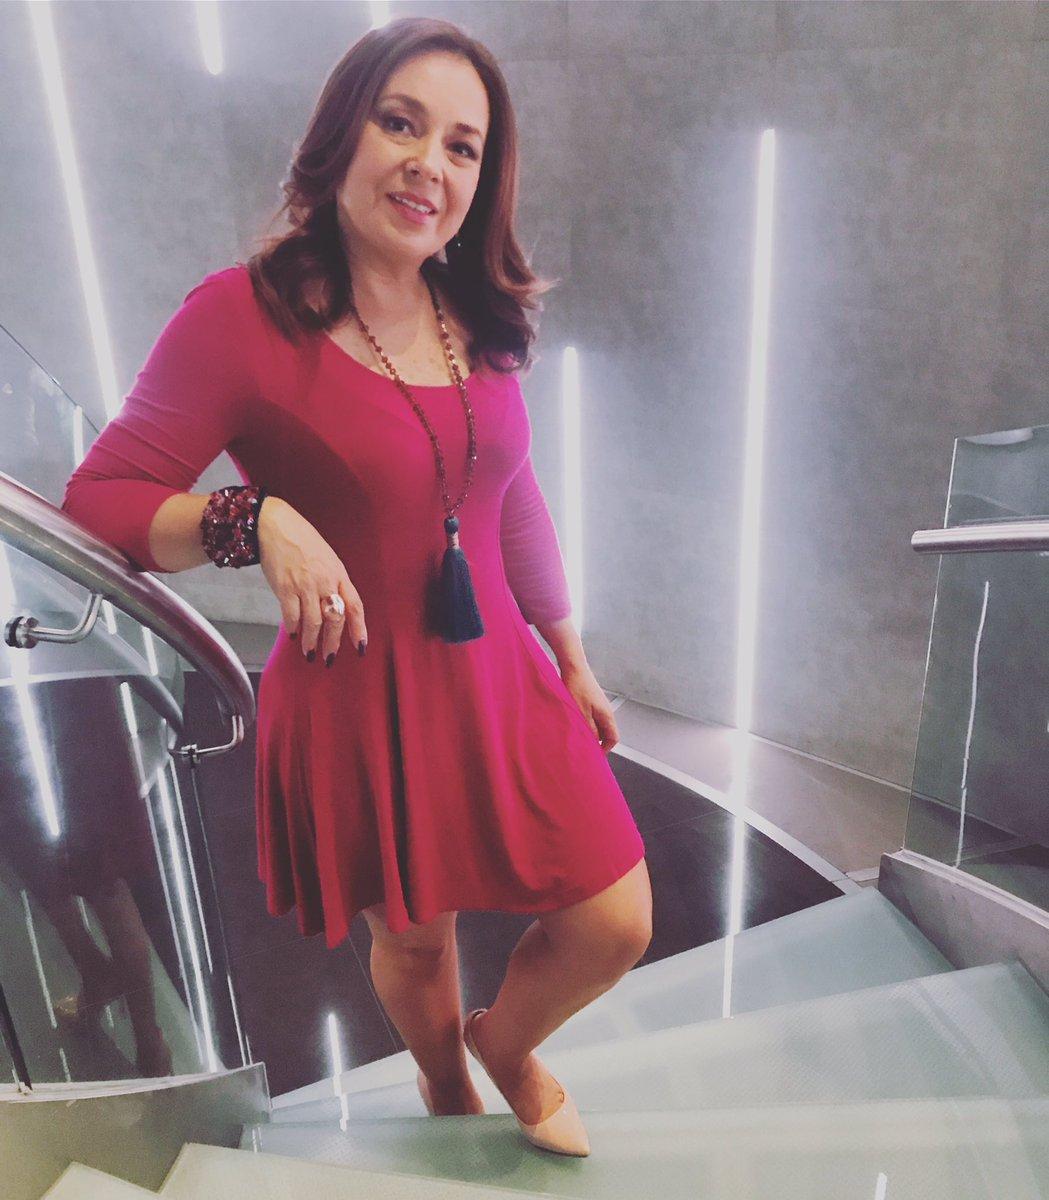 Raquel Méndez Avalos On Twitter Se Mantiene Probabilidad De Lluvia